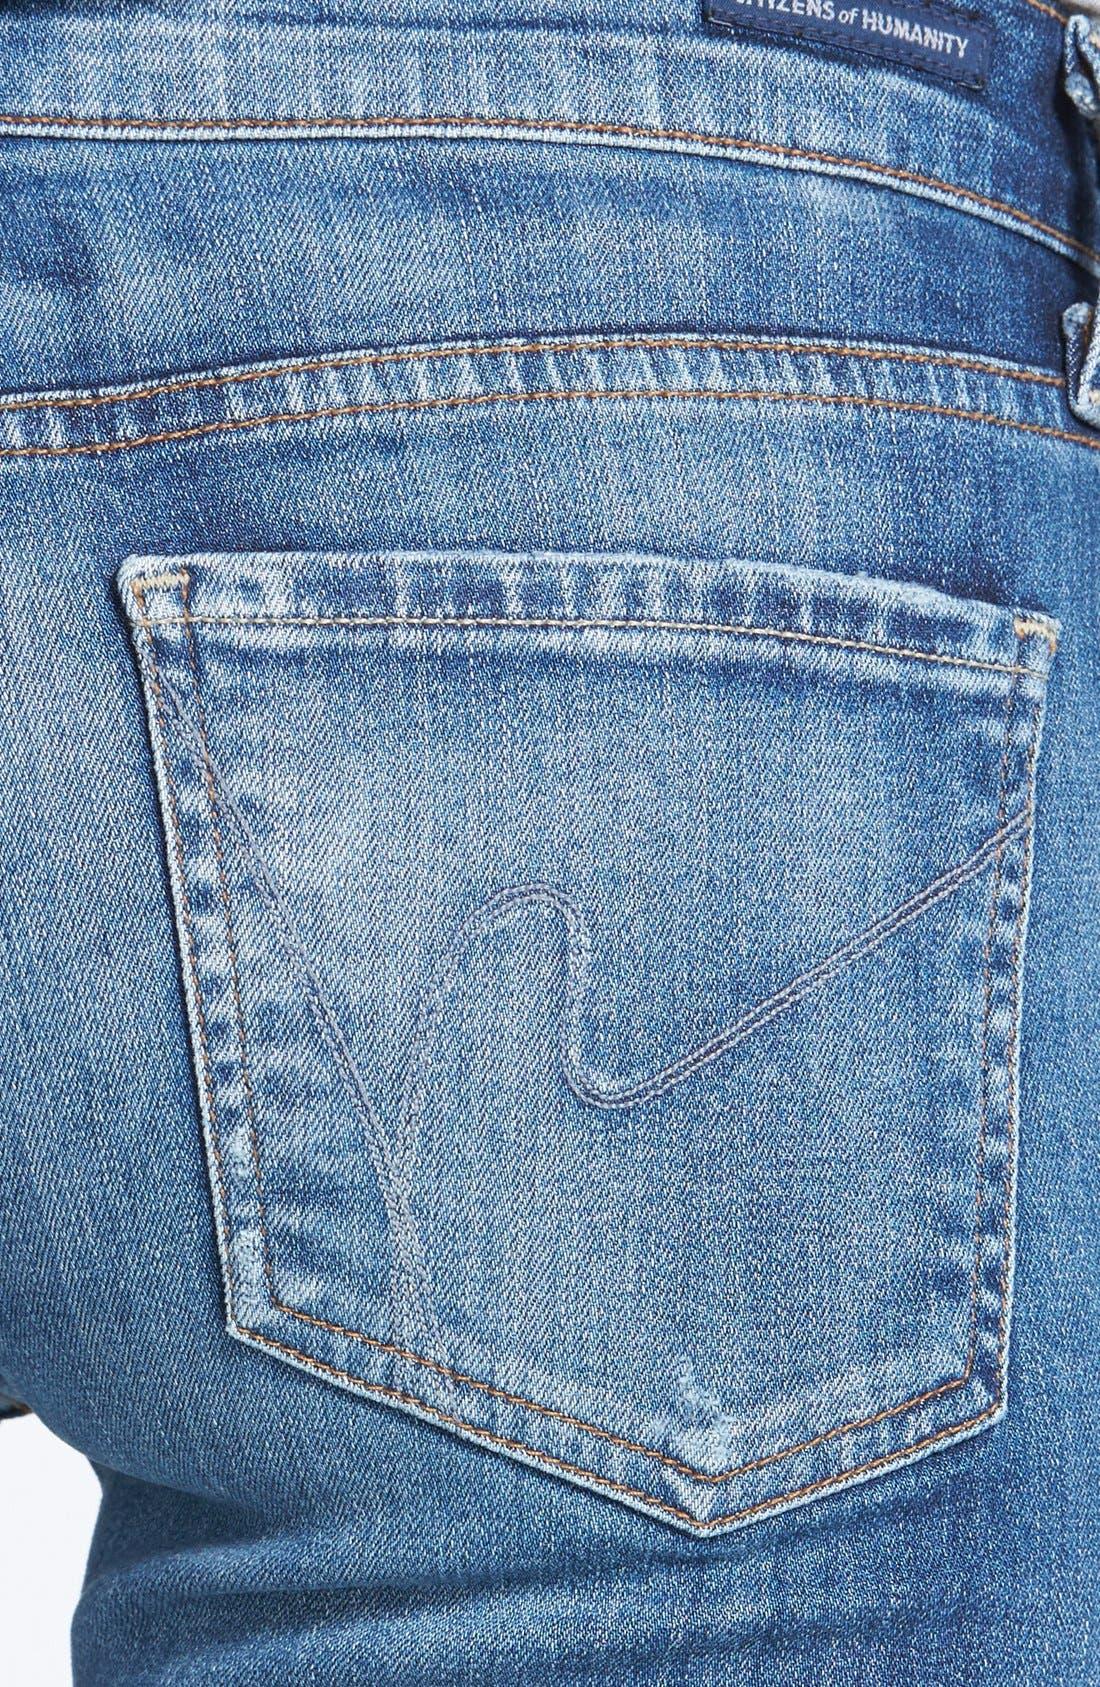 Whiskered Skinny Jeans,                             Alternate thumbnail 3, color,                             Weekender